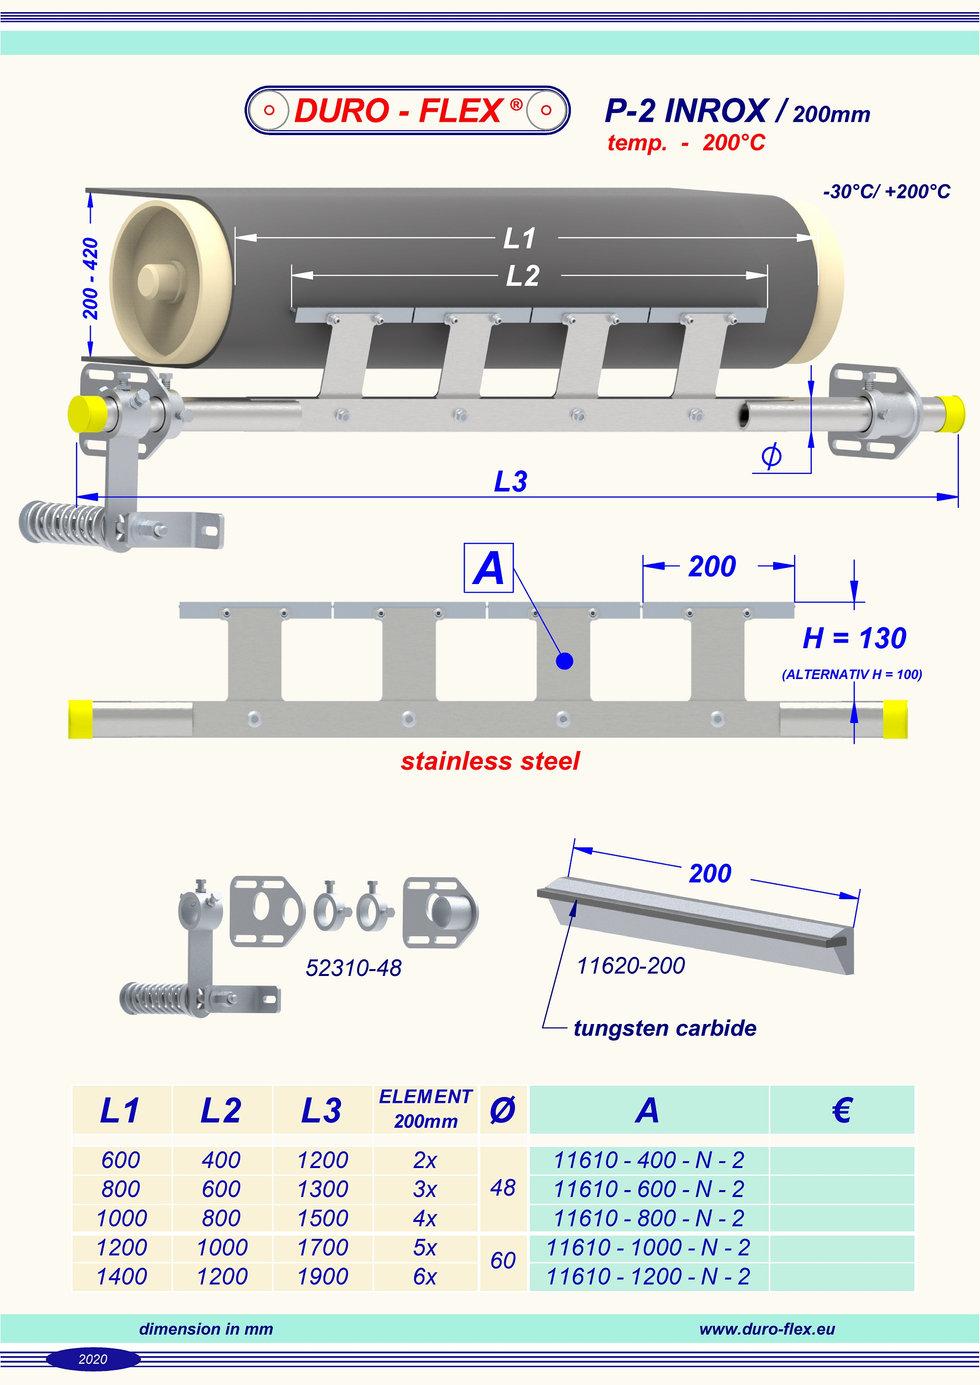 Typenliste P-2 INROX_200_S1.jpg